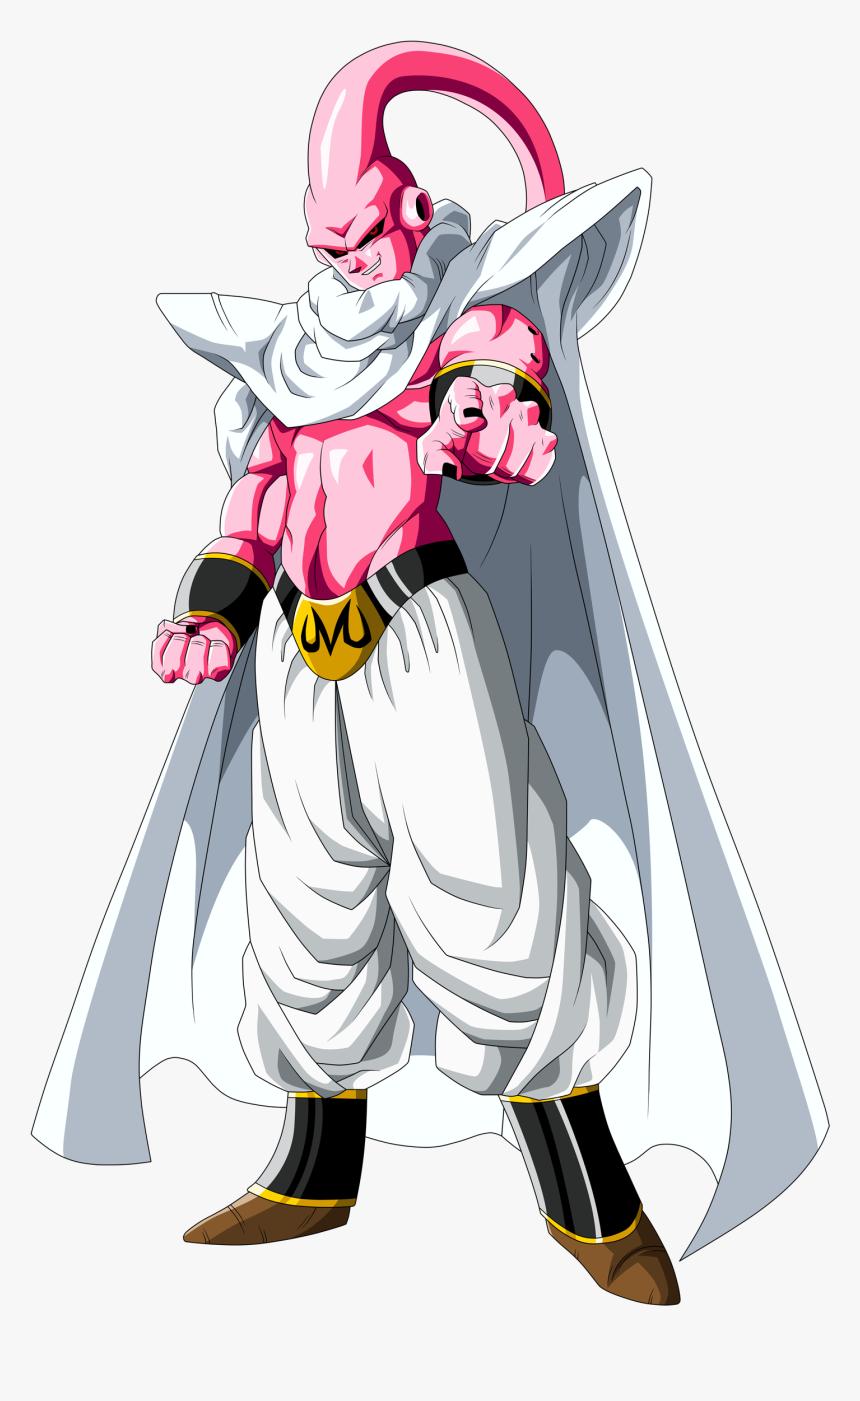 Super Boo Piccolo Dbz, HD Png Download, Free Download